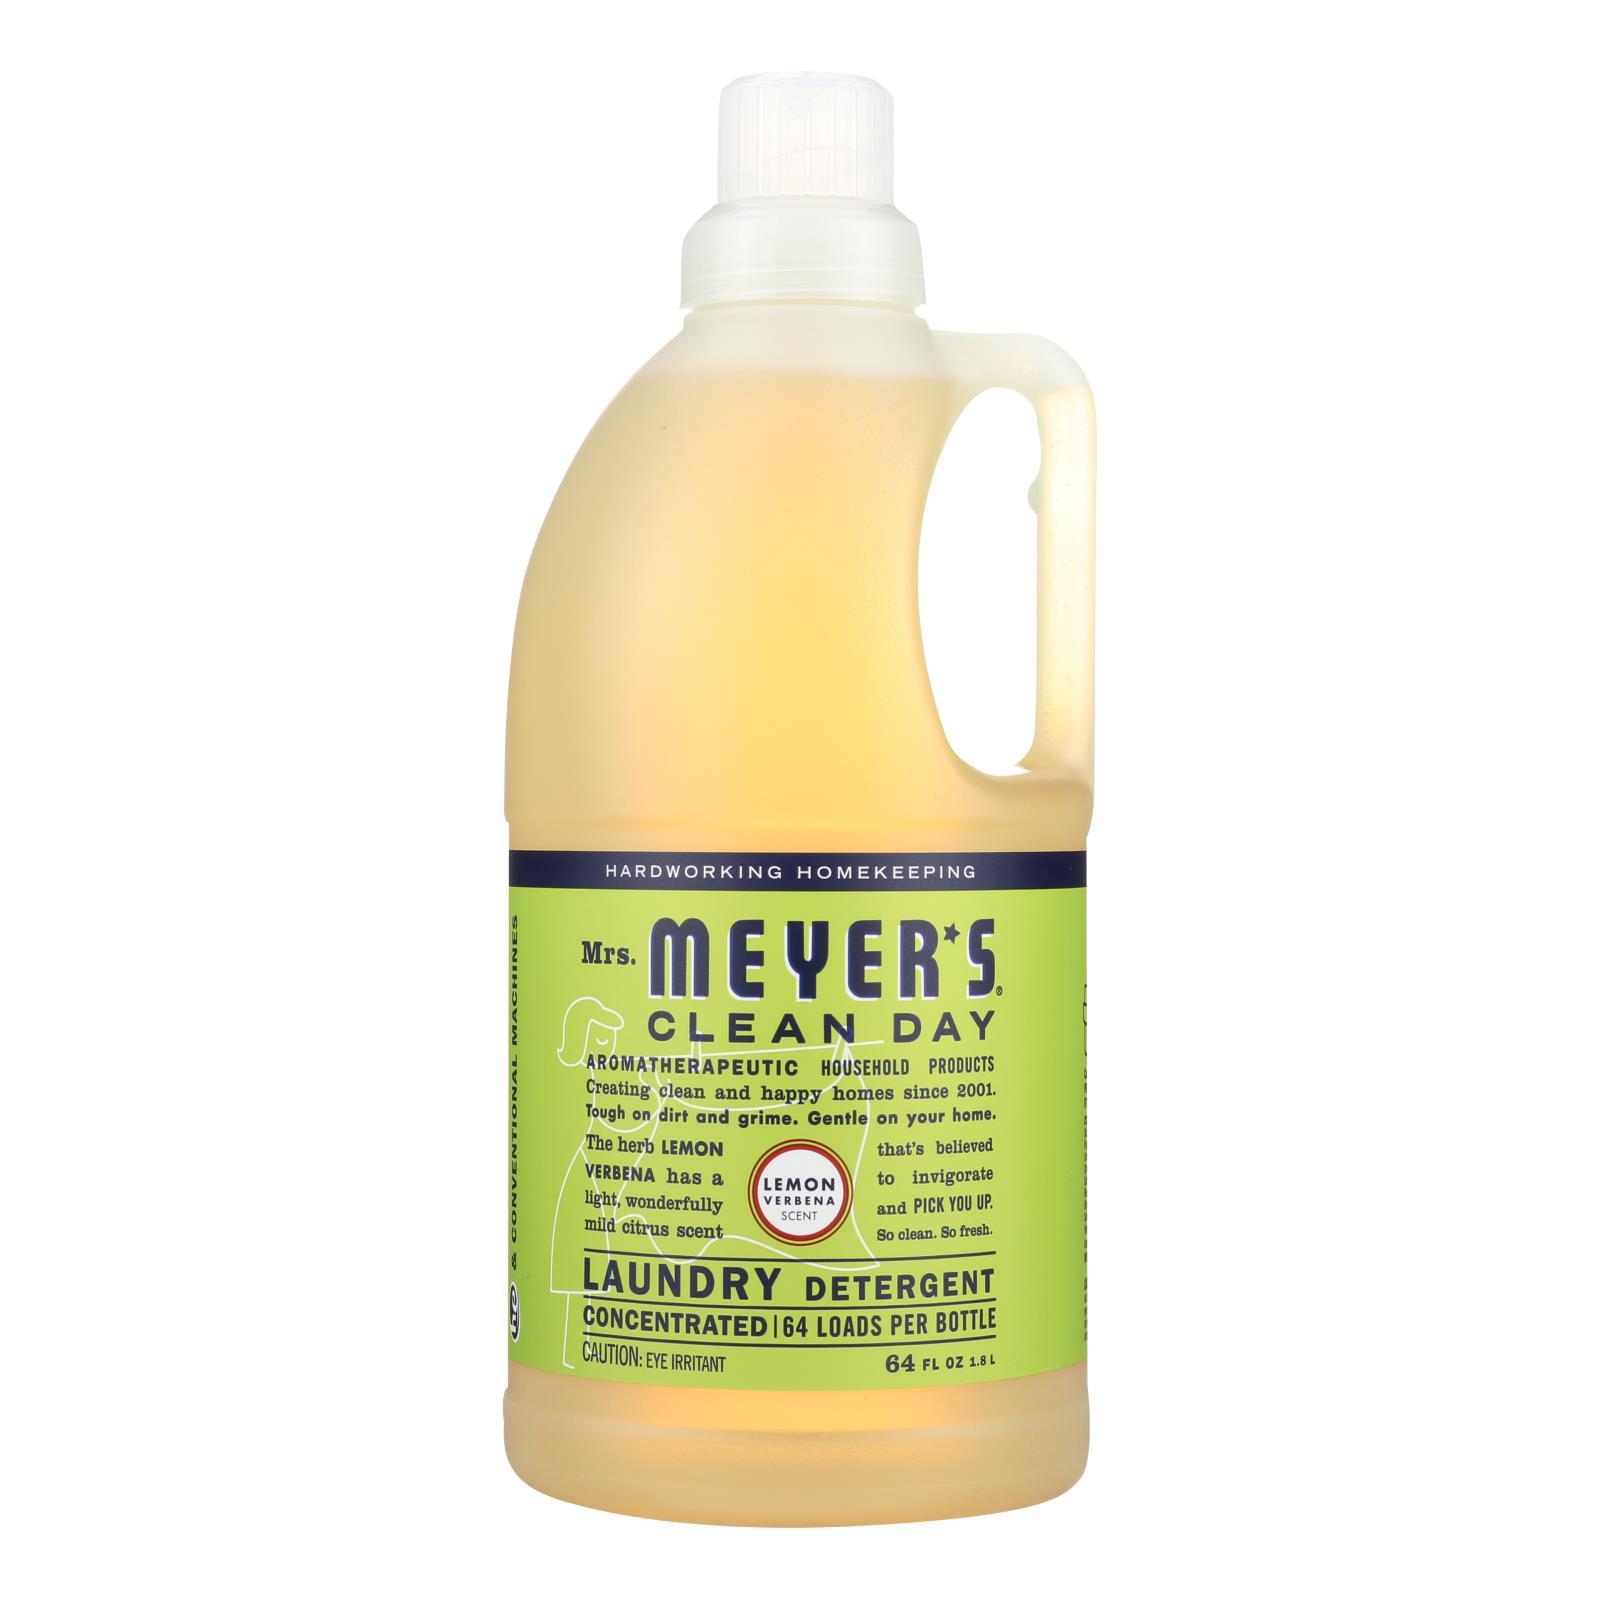 Mrs. Meyer's Clean Day - 2X Laundry Detergent - Lemon Verbana - Case of 6 - 64 oz